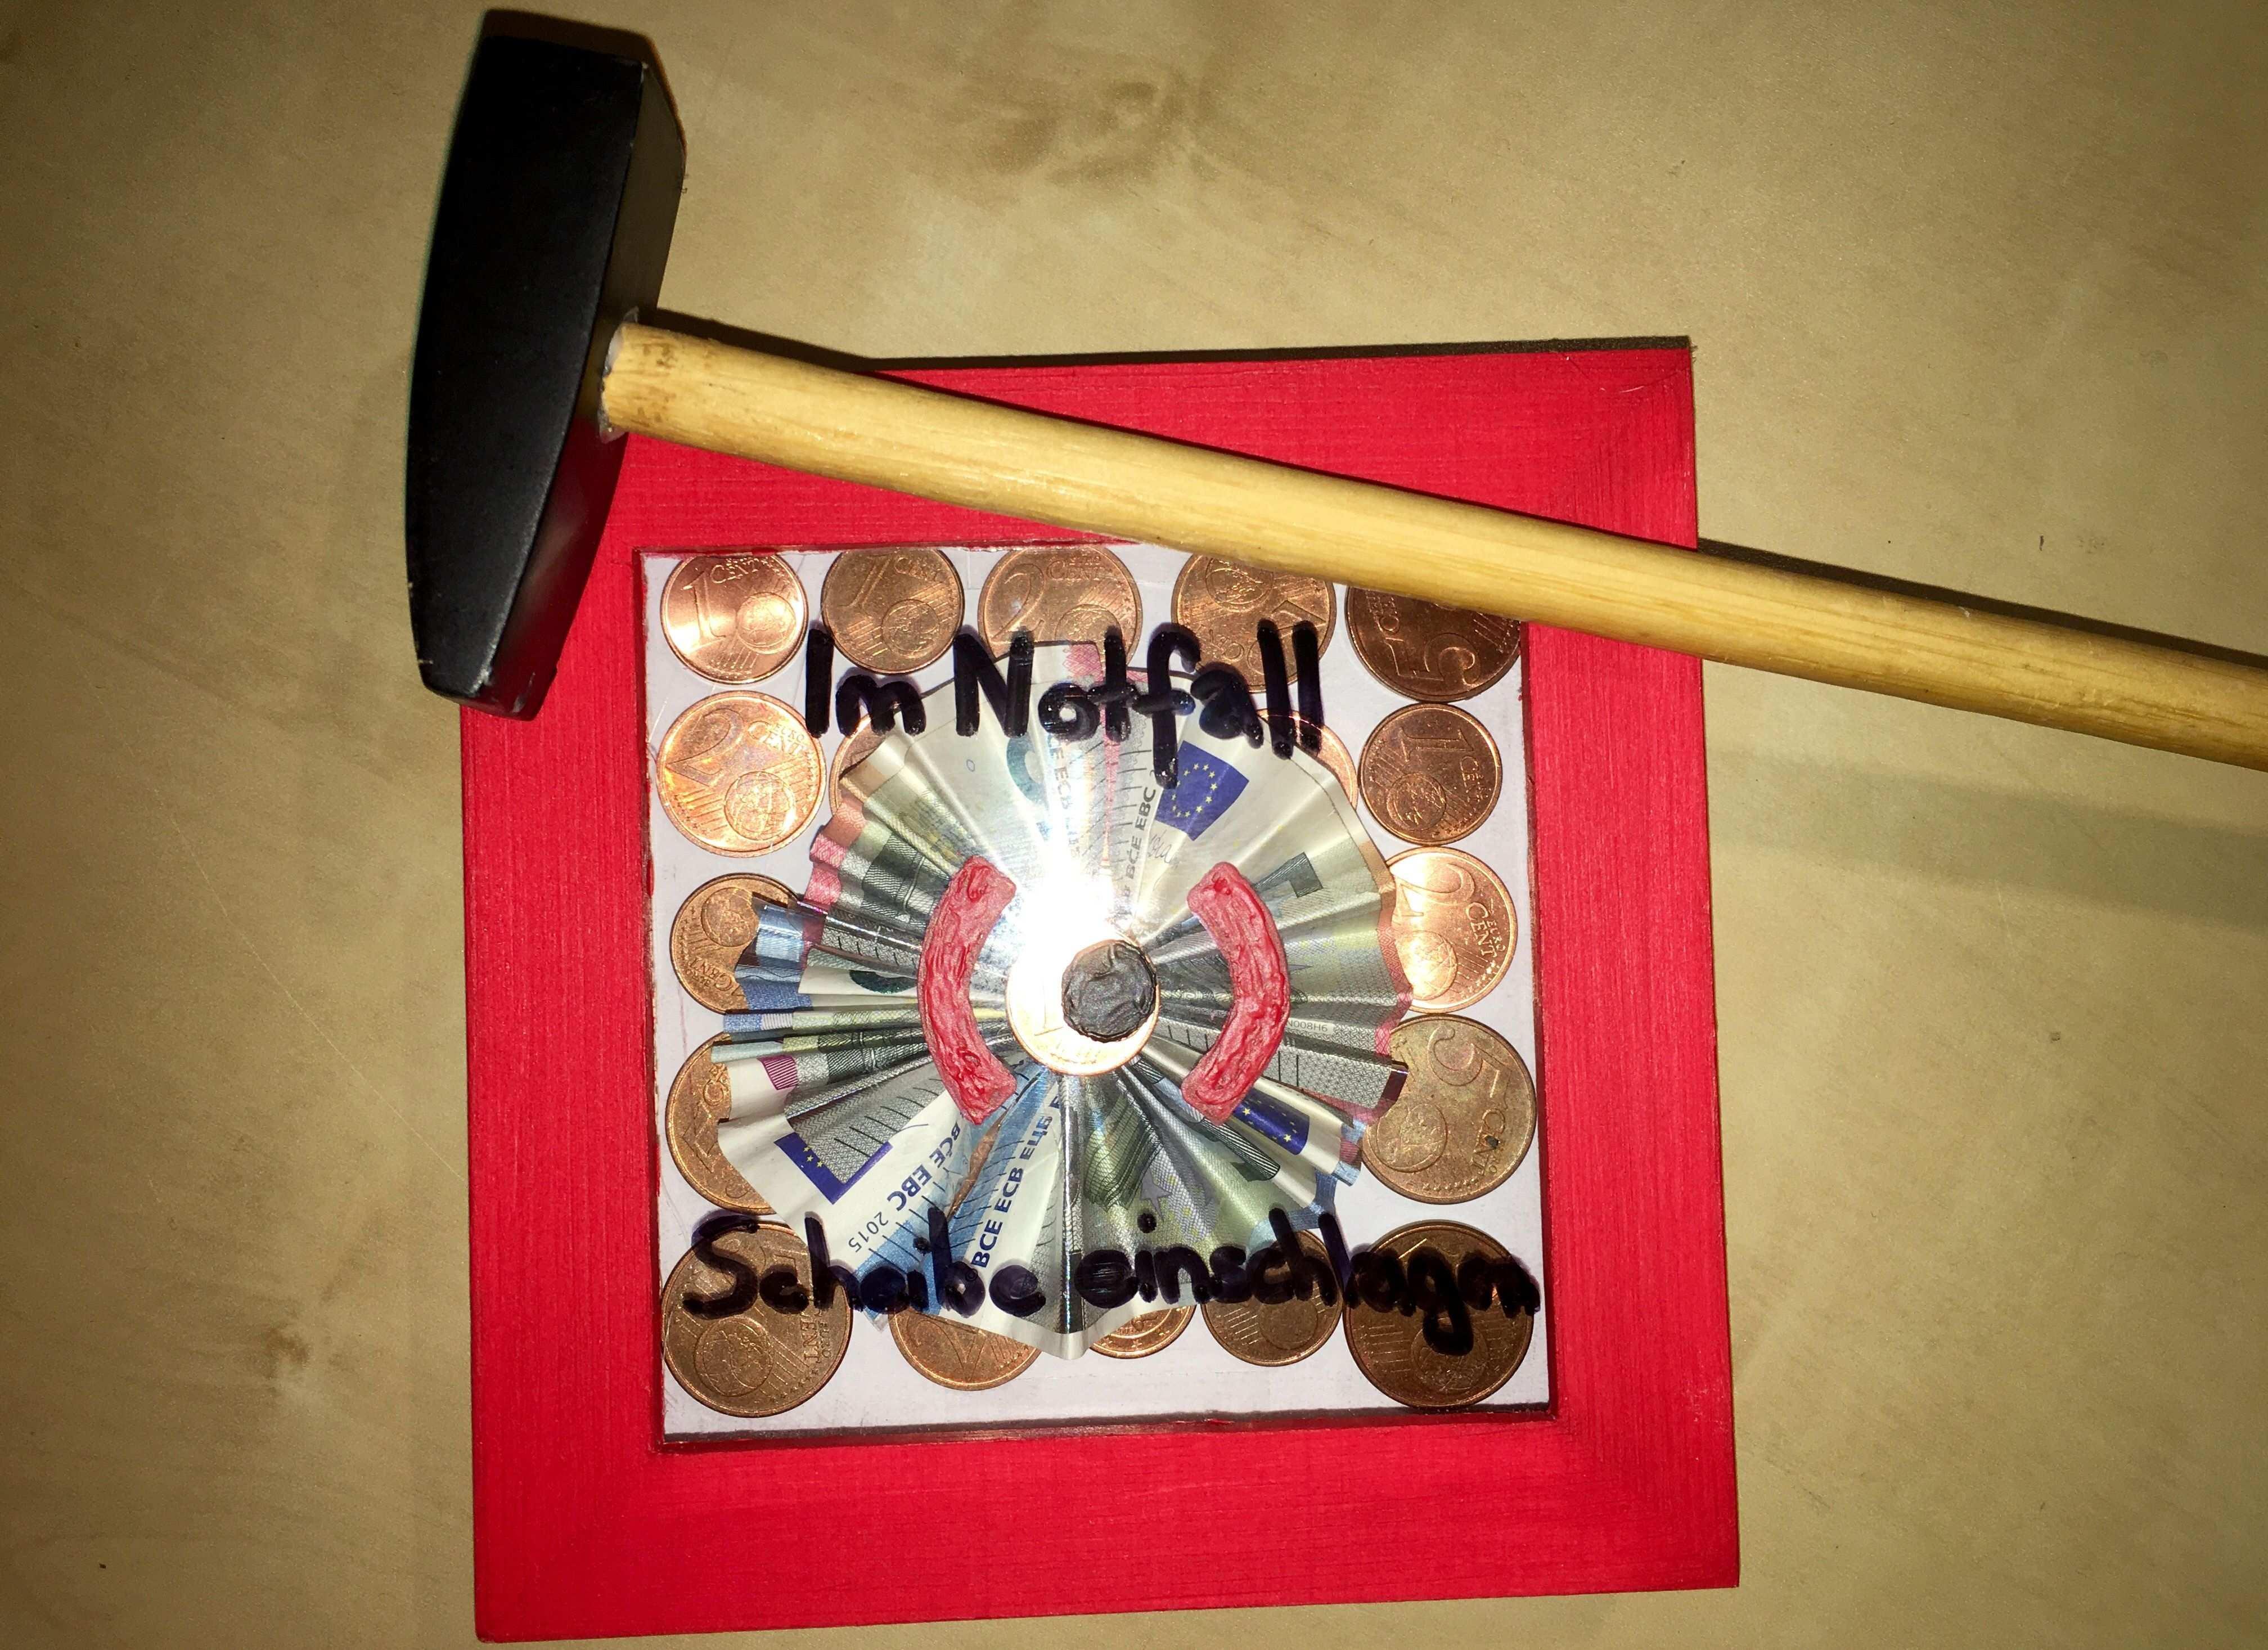 Geldgeschenk Im Notfall Scheibe Einschlagen Geburtsag Geschenk 3d Bilderrahmen 3d Bilderrahmen Geschenke Einpacken Geschenkideen